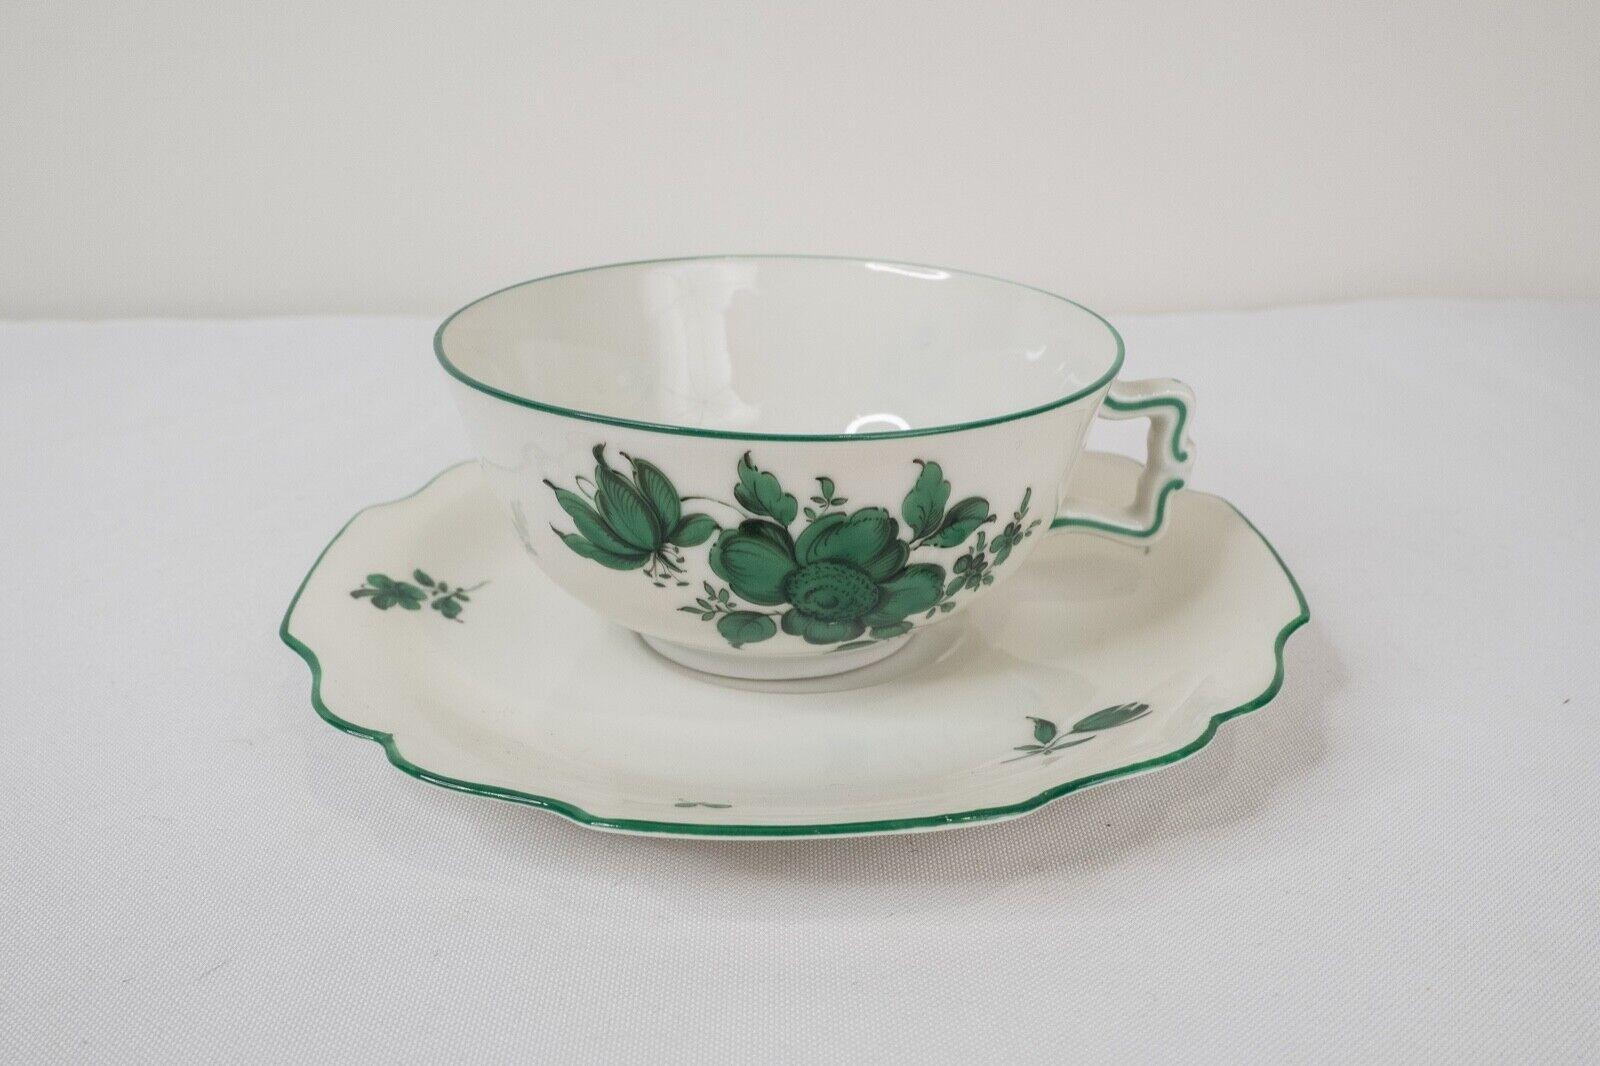 Image 1 - Augarten-Wien-Vienna-Maria-Theresia-Tea-Cup-amp-Saucer-Green-Trim-5098